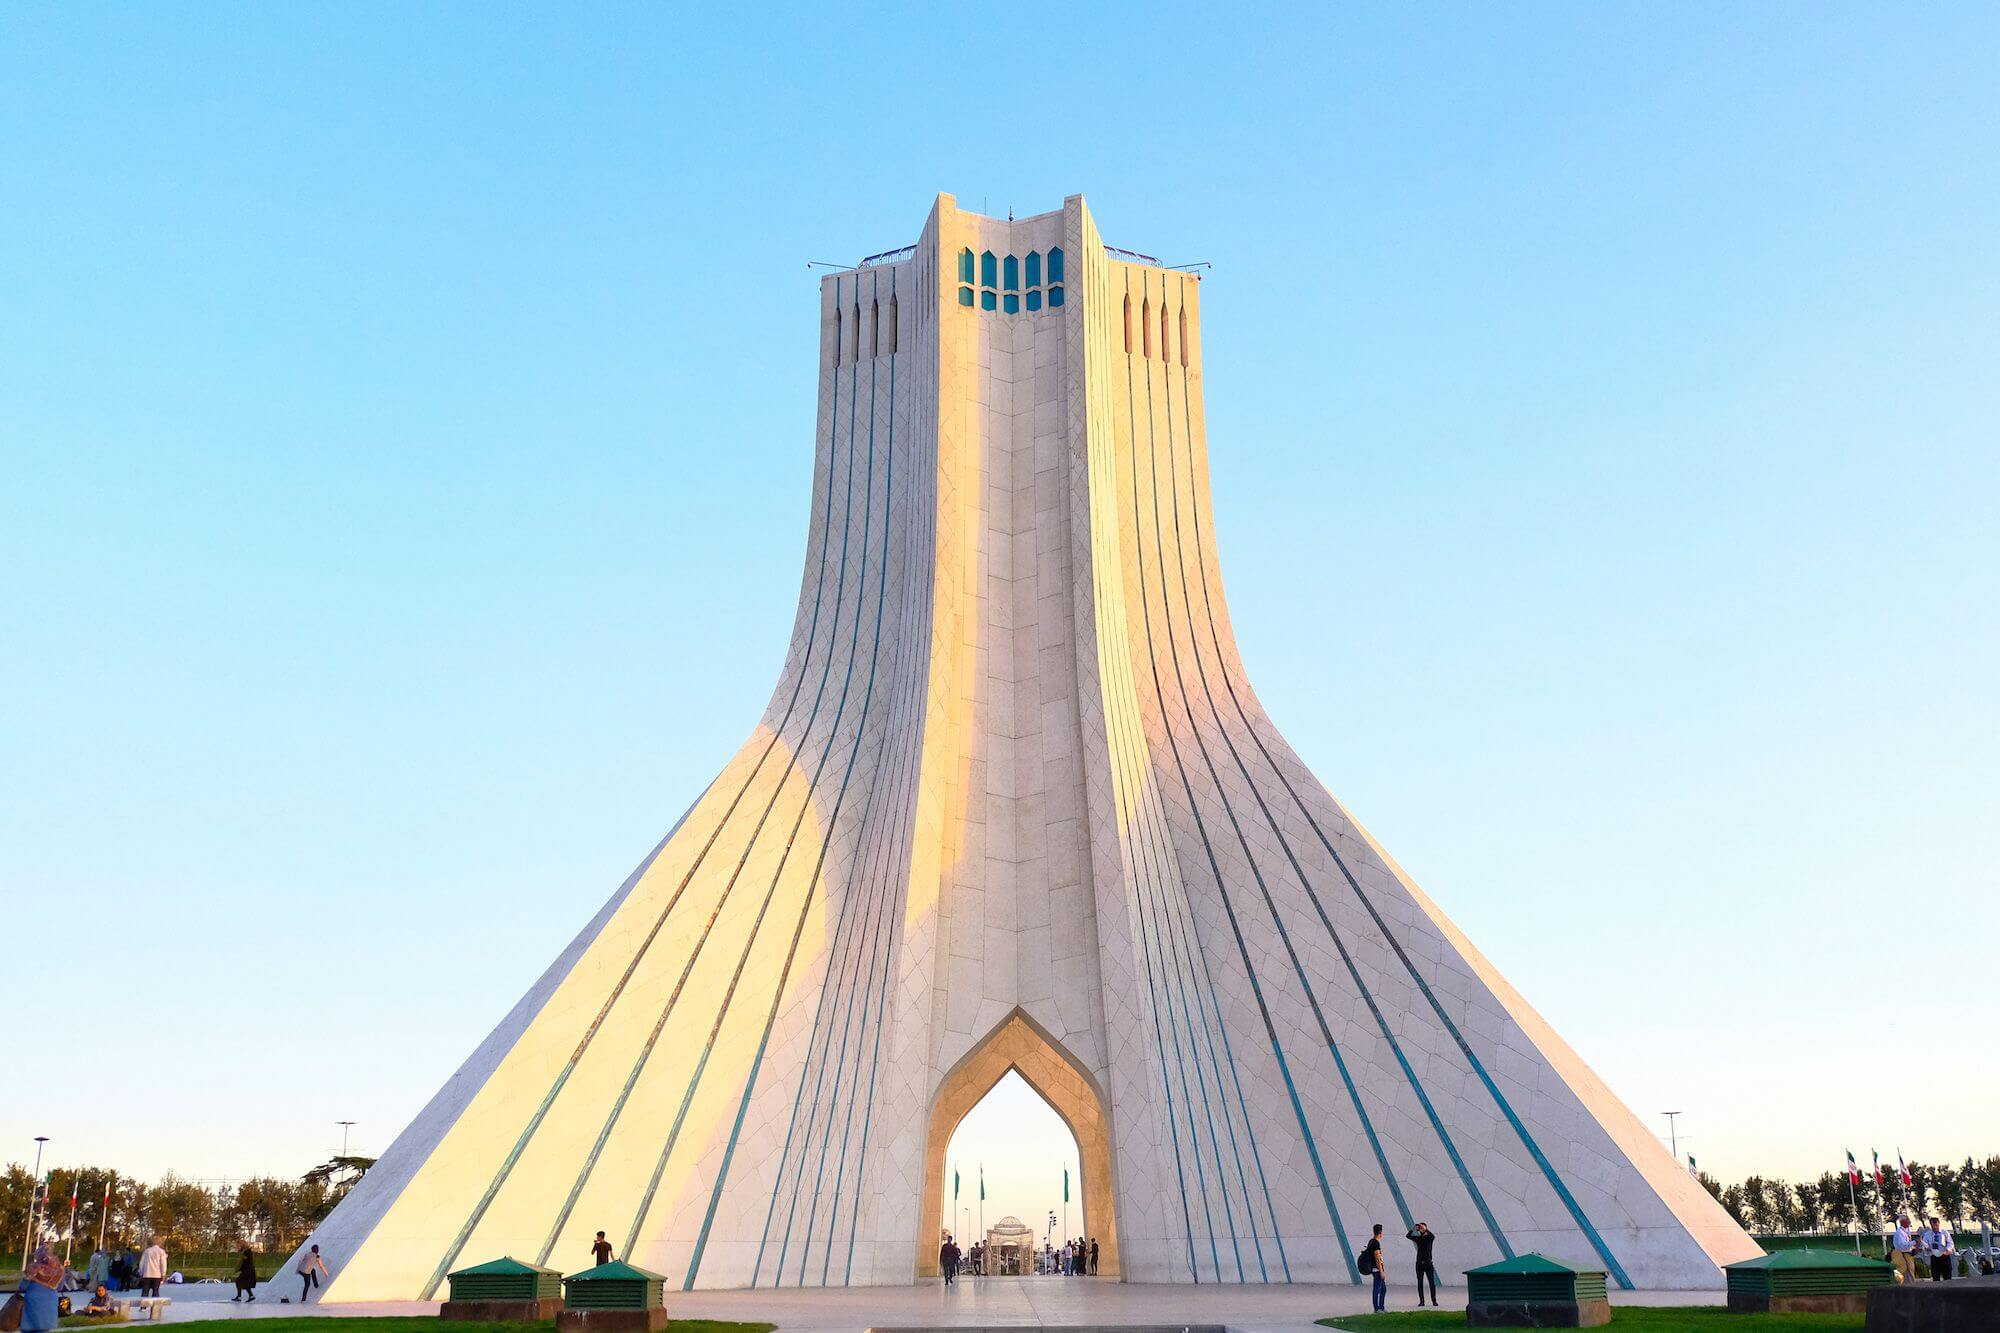 Teheran Azadi Tower 2 compressor 3 giorni a Teheran